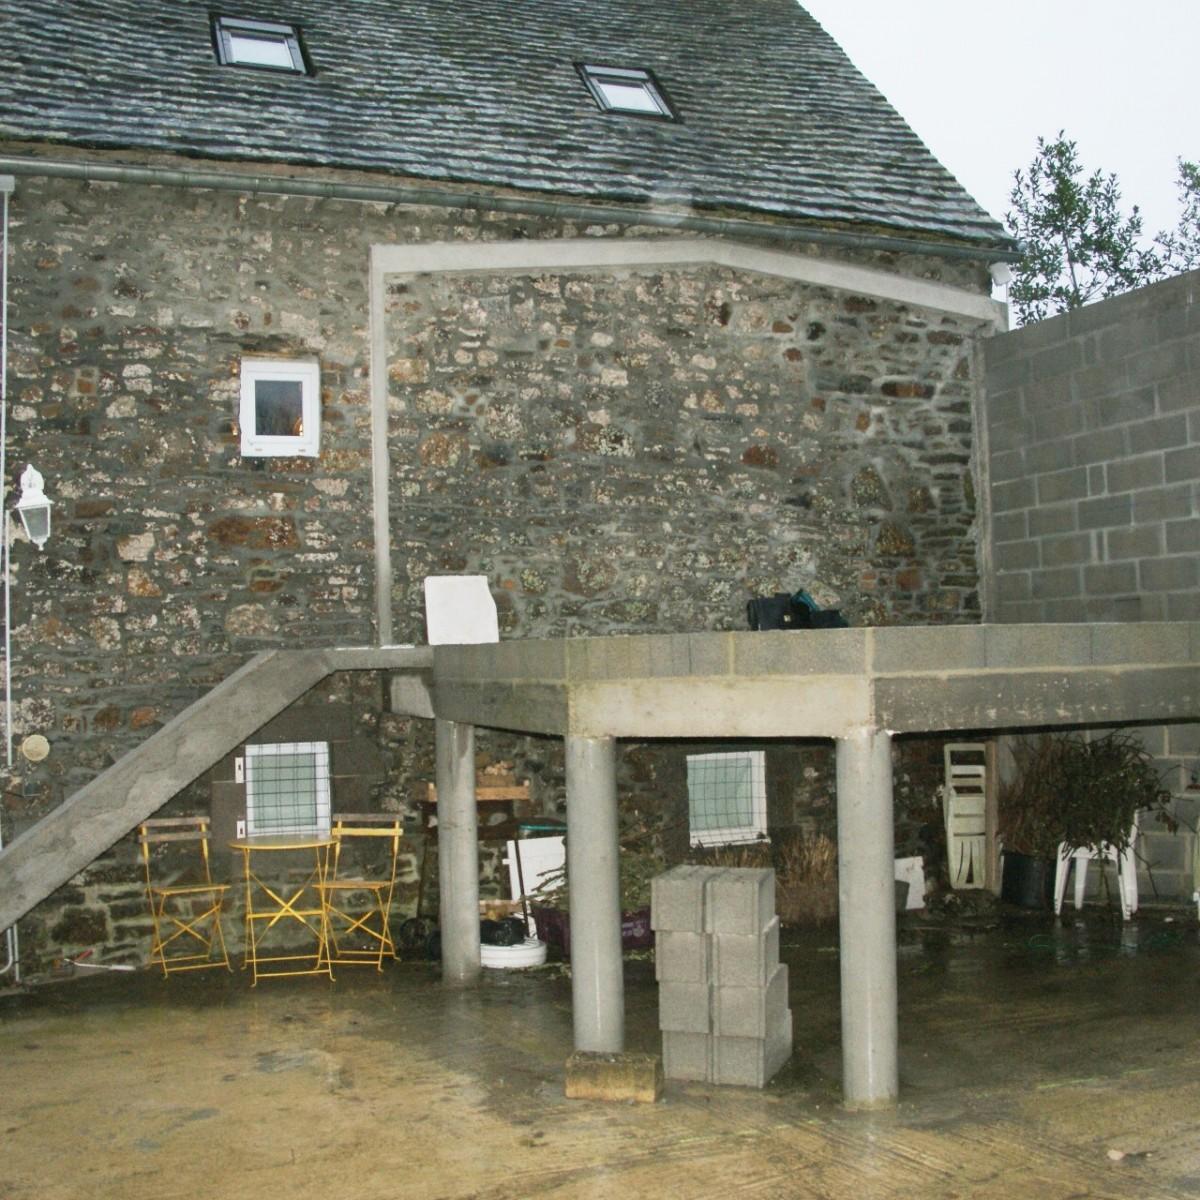 Nos r alisations travaux expert - Construction veranda sur terrasse ...